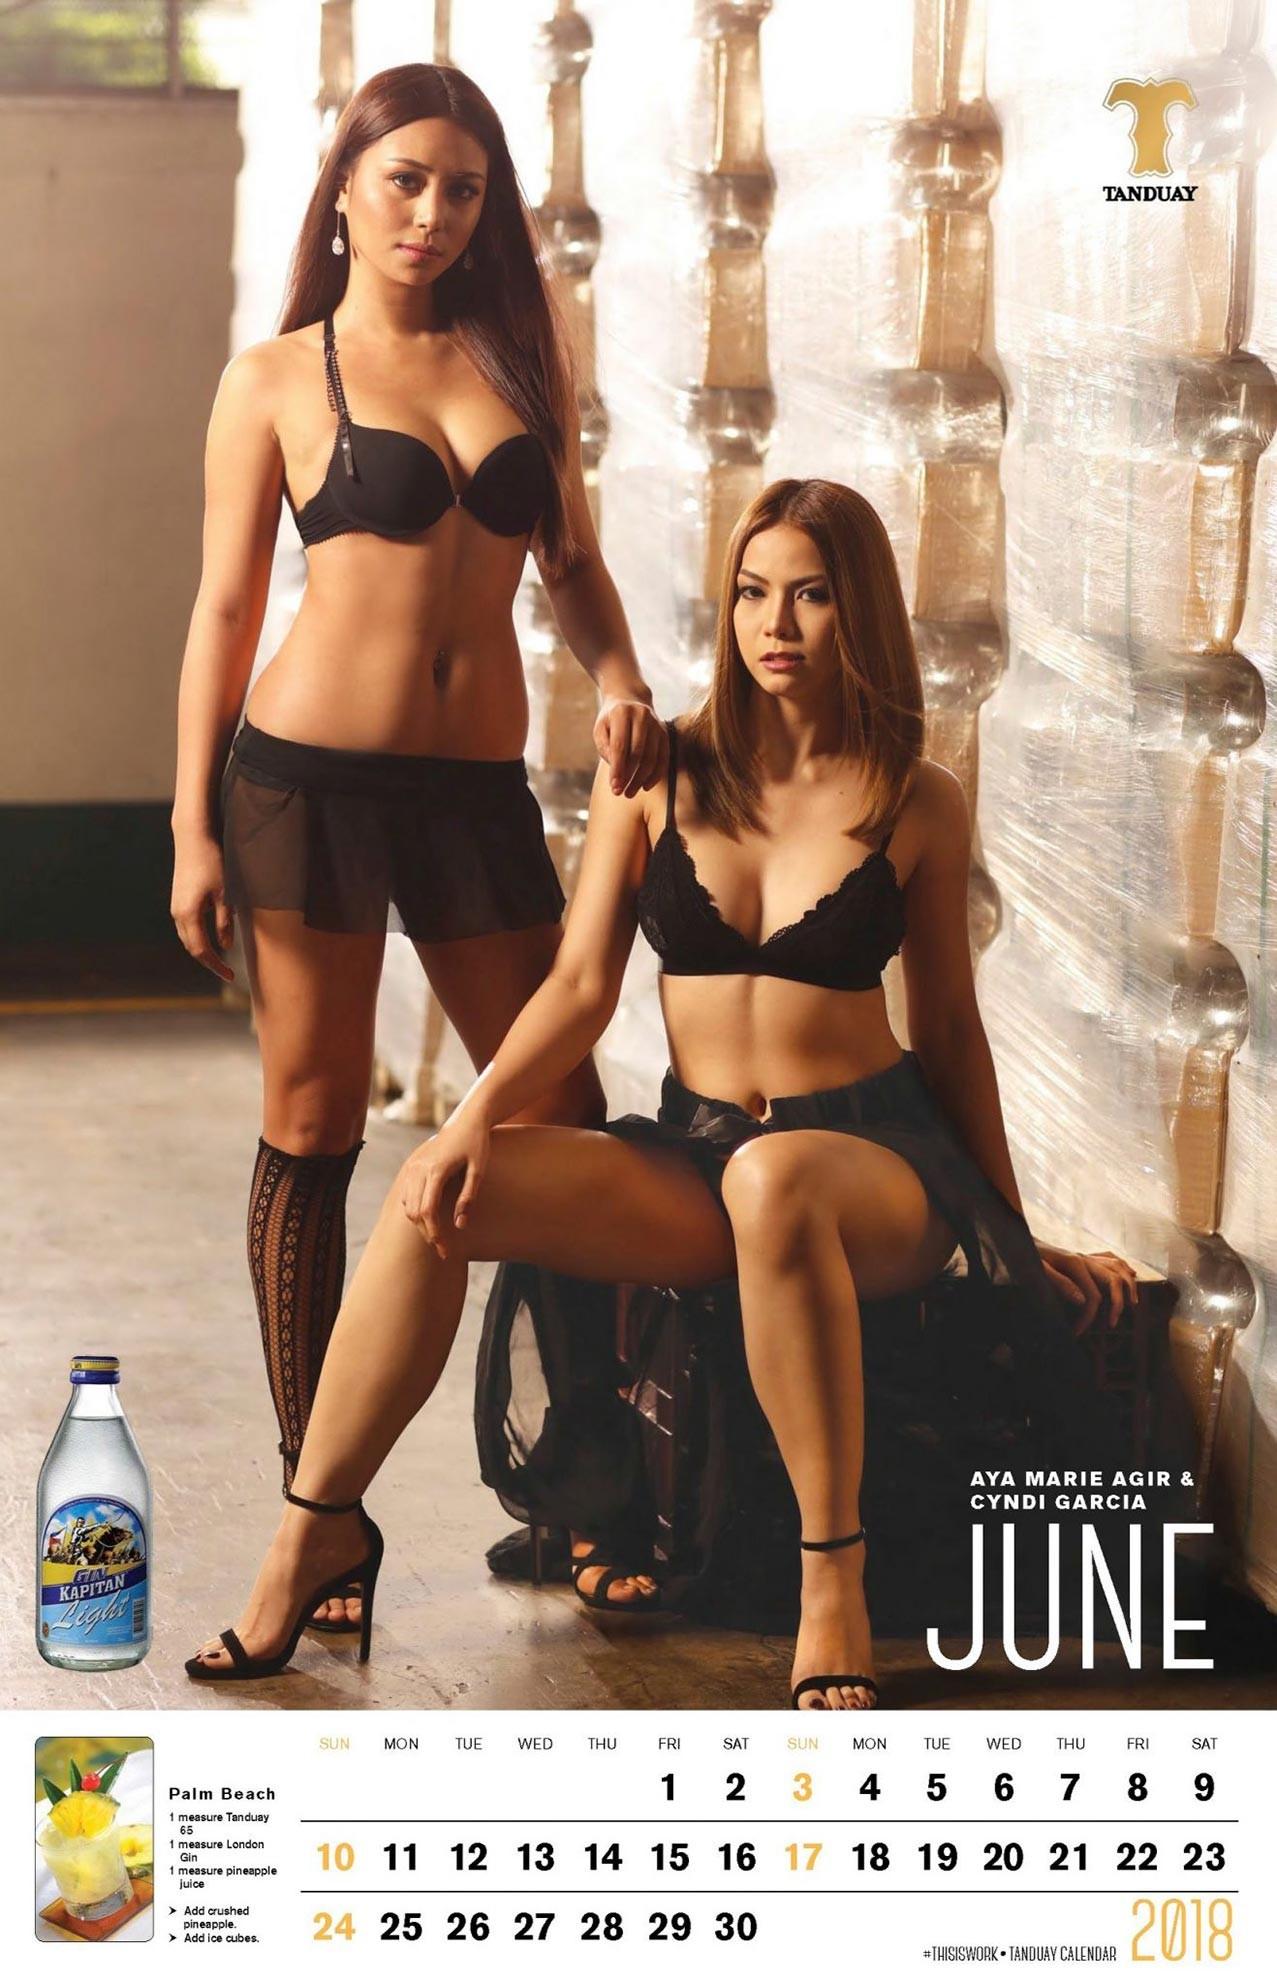 работящие девушки в календаре FHM Philippines and Tanduay 2018 calendar